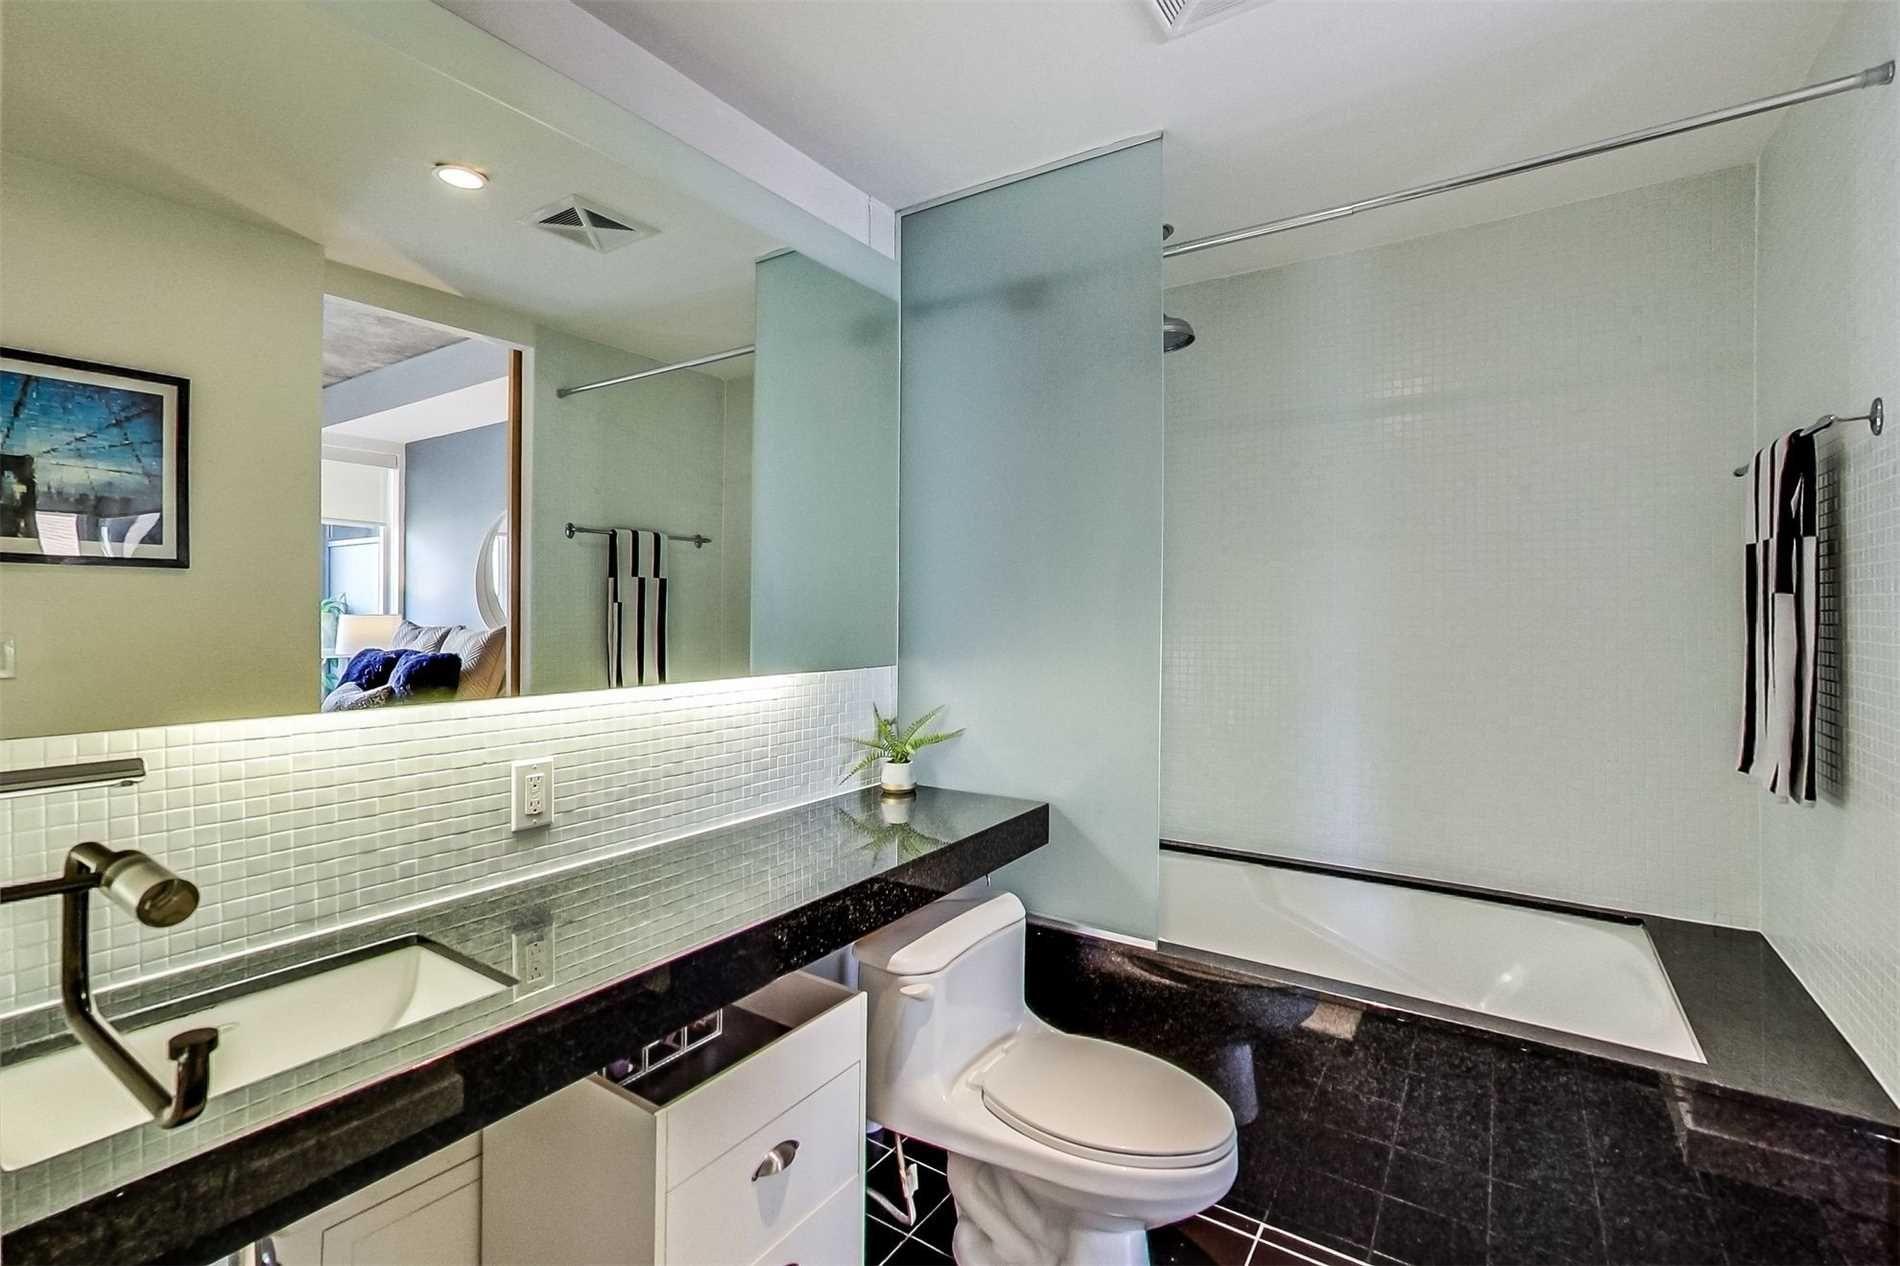 Photo 11: Photos: 307 1 Shaw Street in Toronto: Niagara Condo for sale (Toronto C01)  : MLS®# C4525736